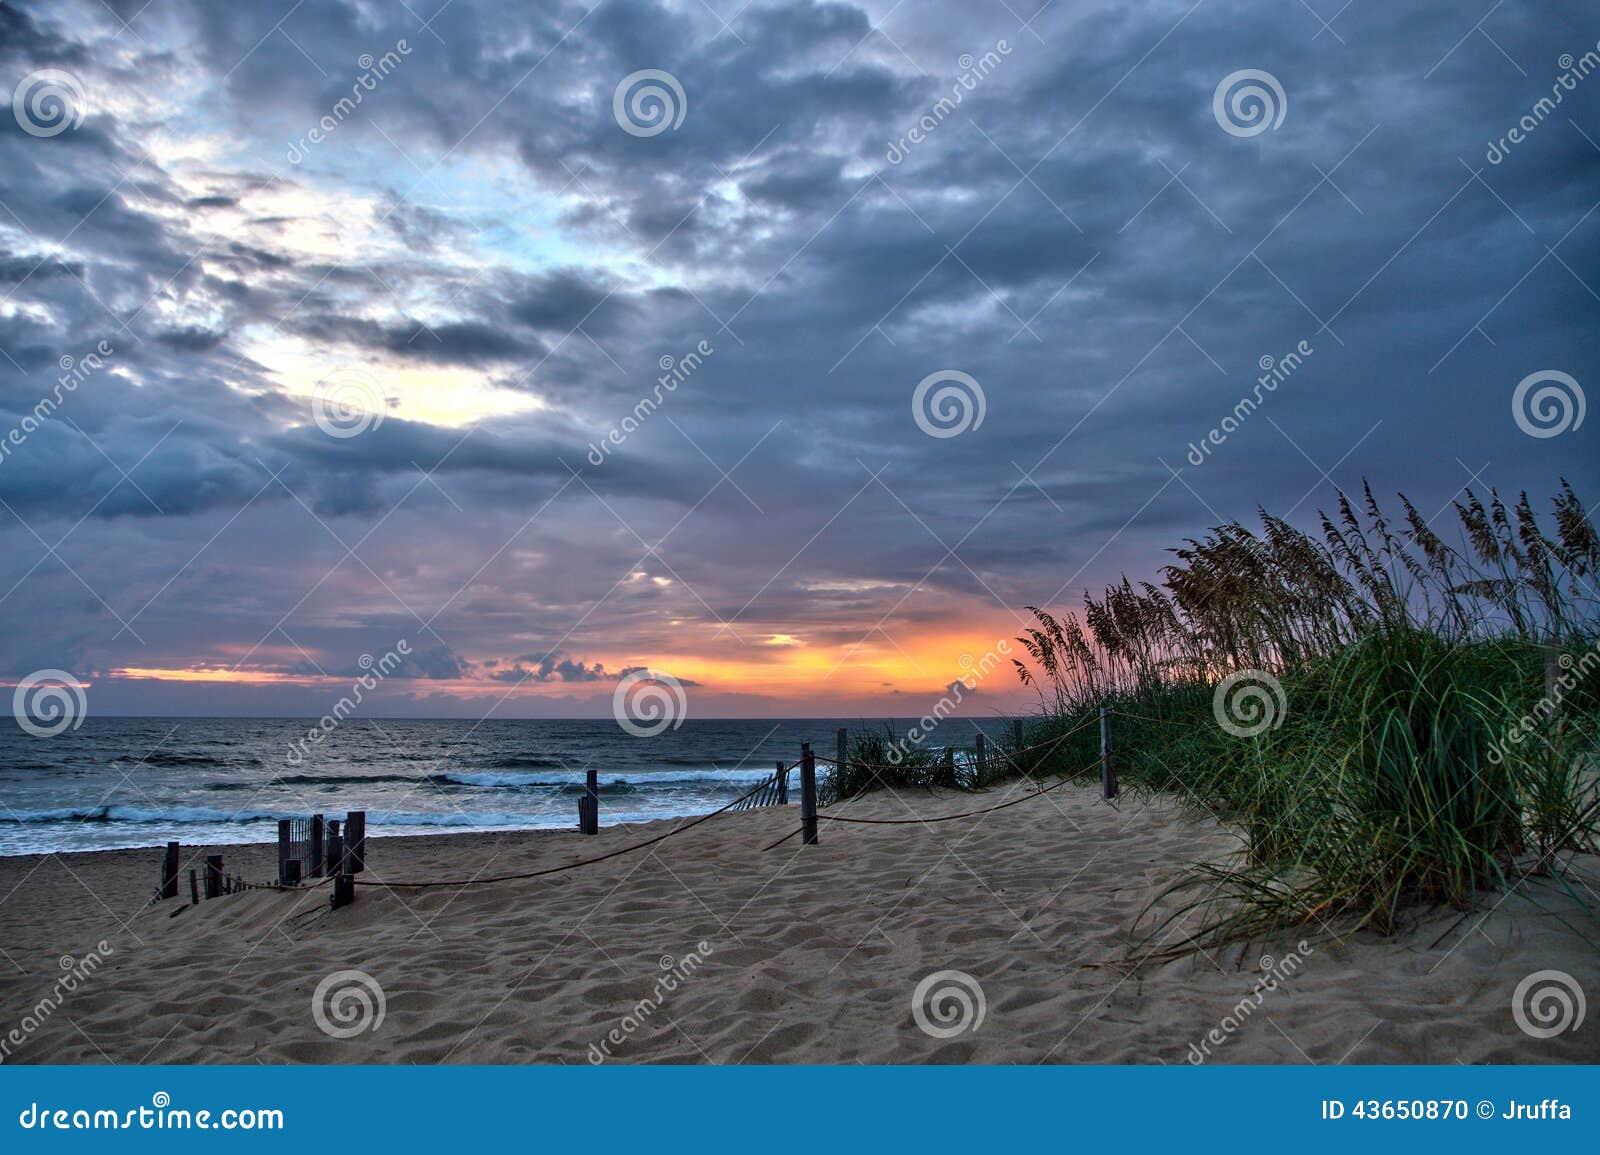 Storm clouds at beach sunrise